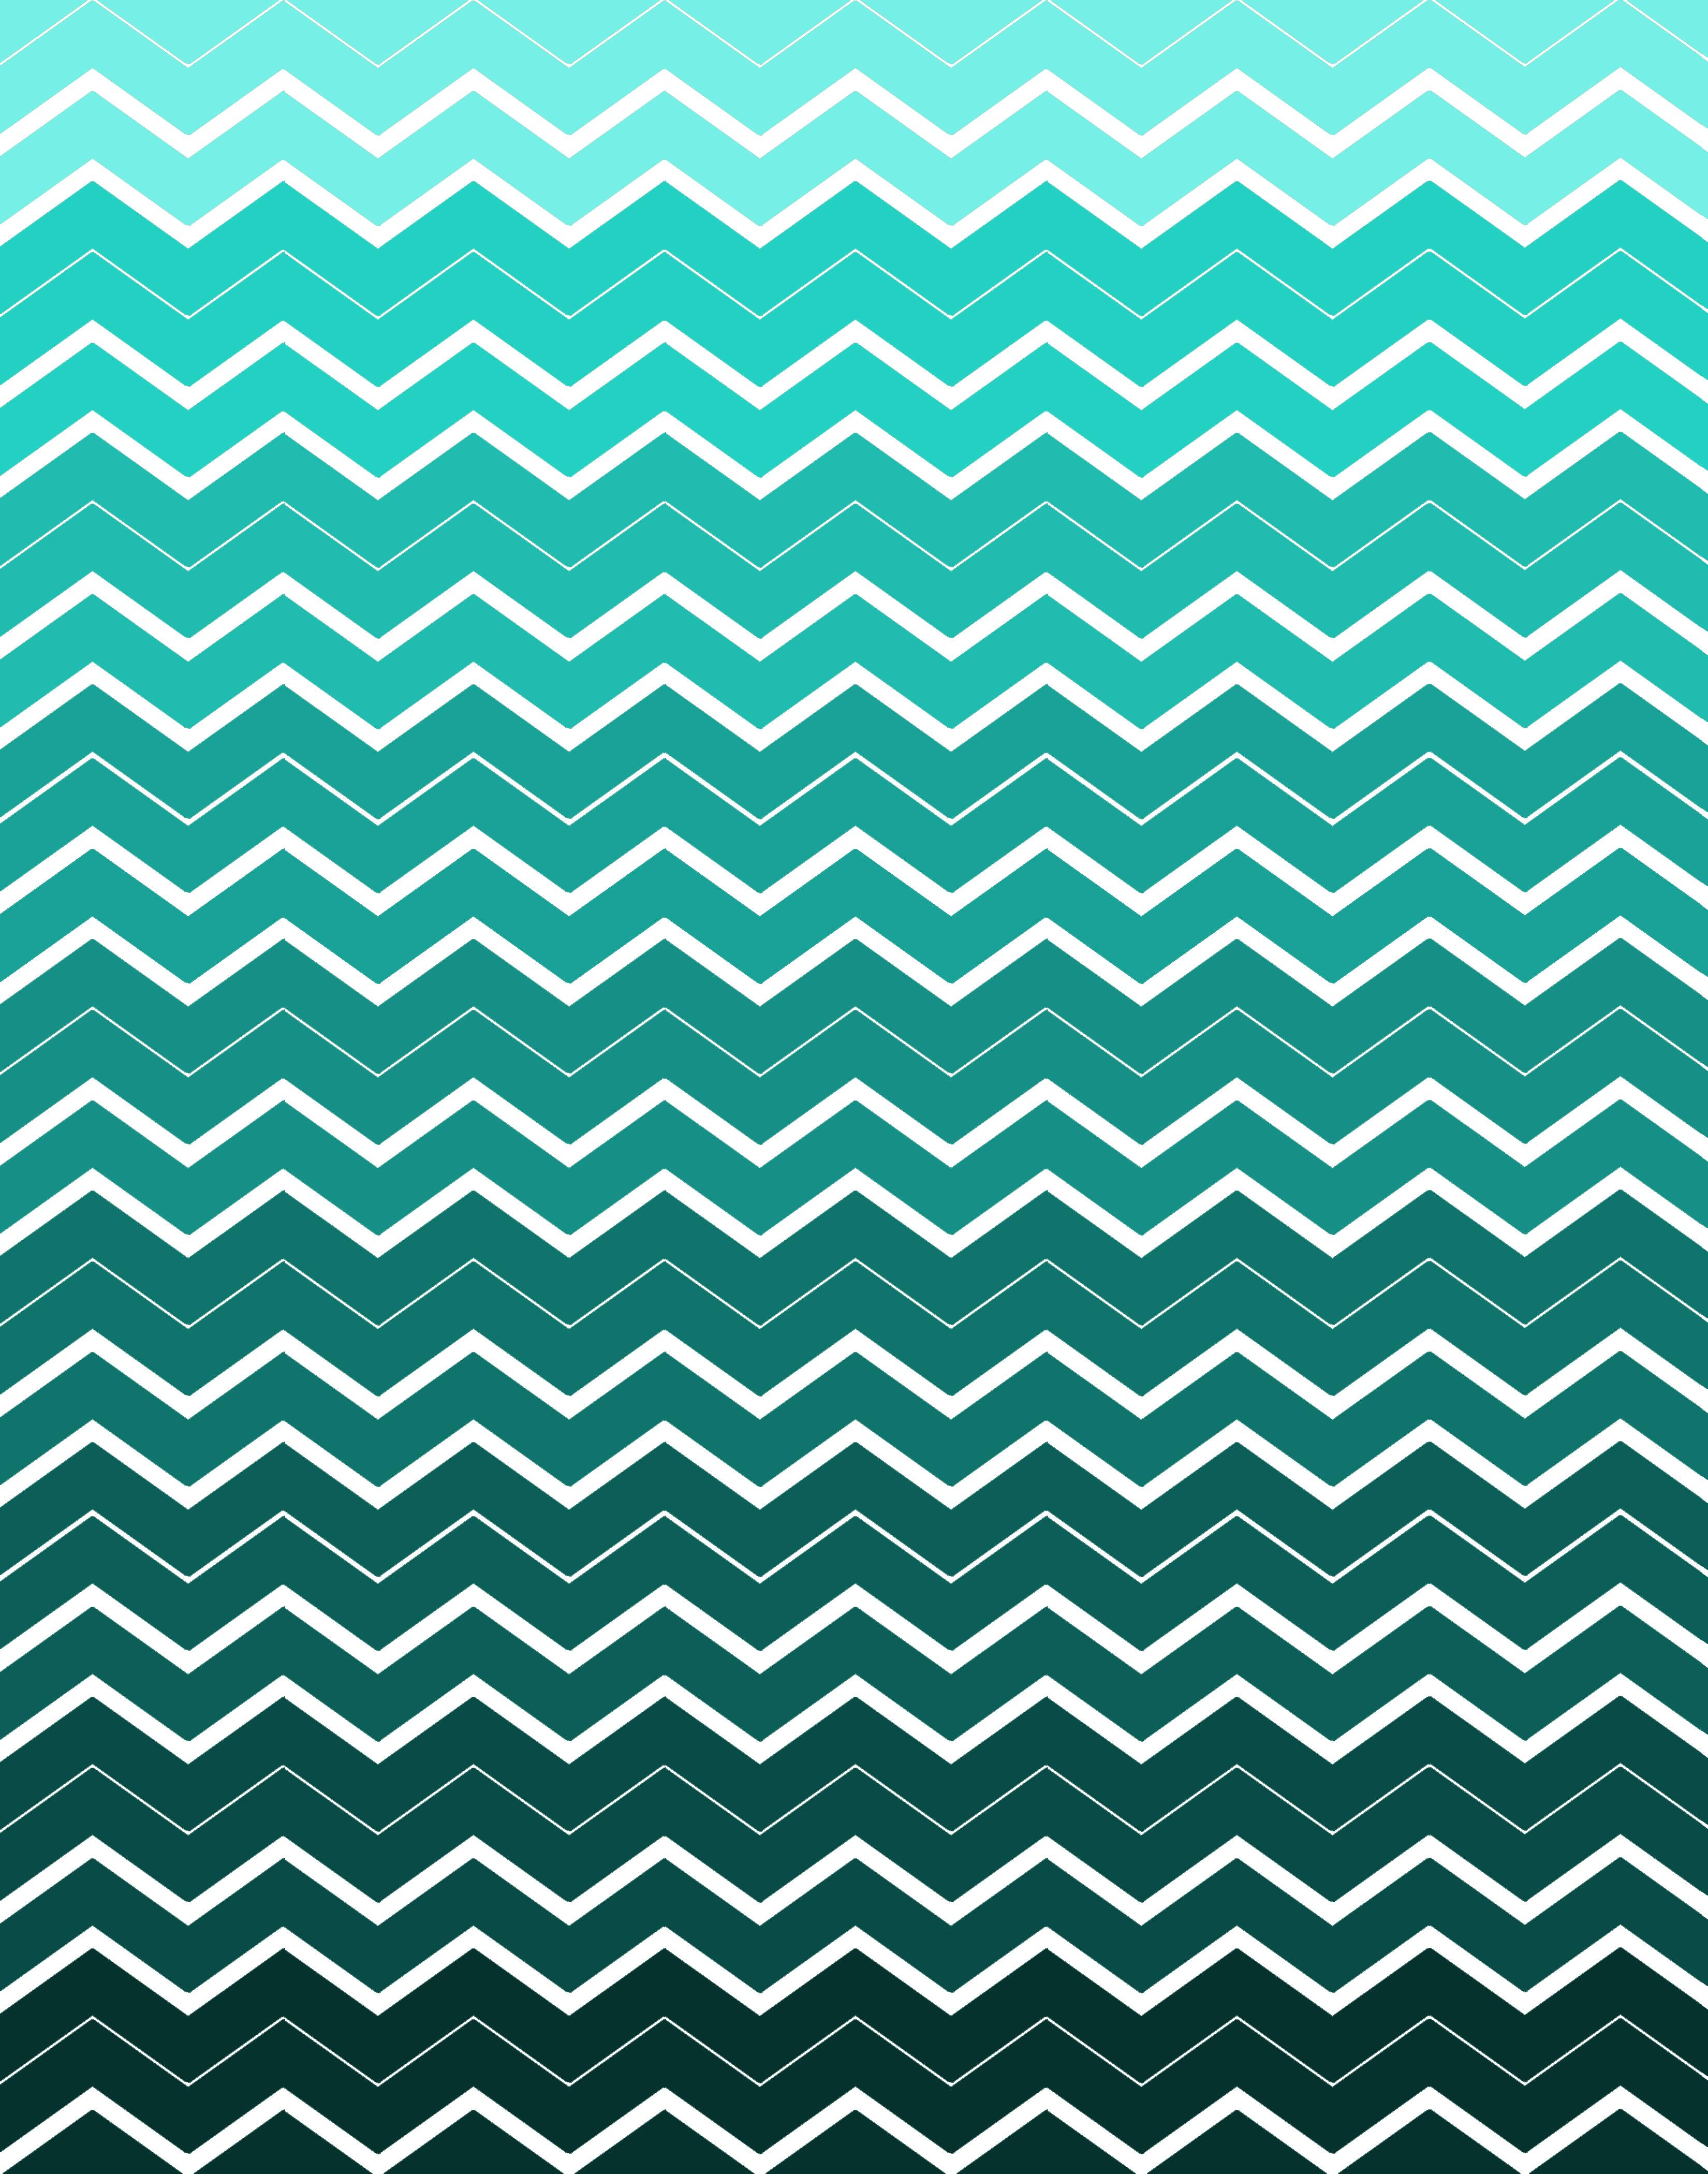 www chevron computer wallpaper - photo #4